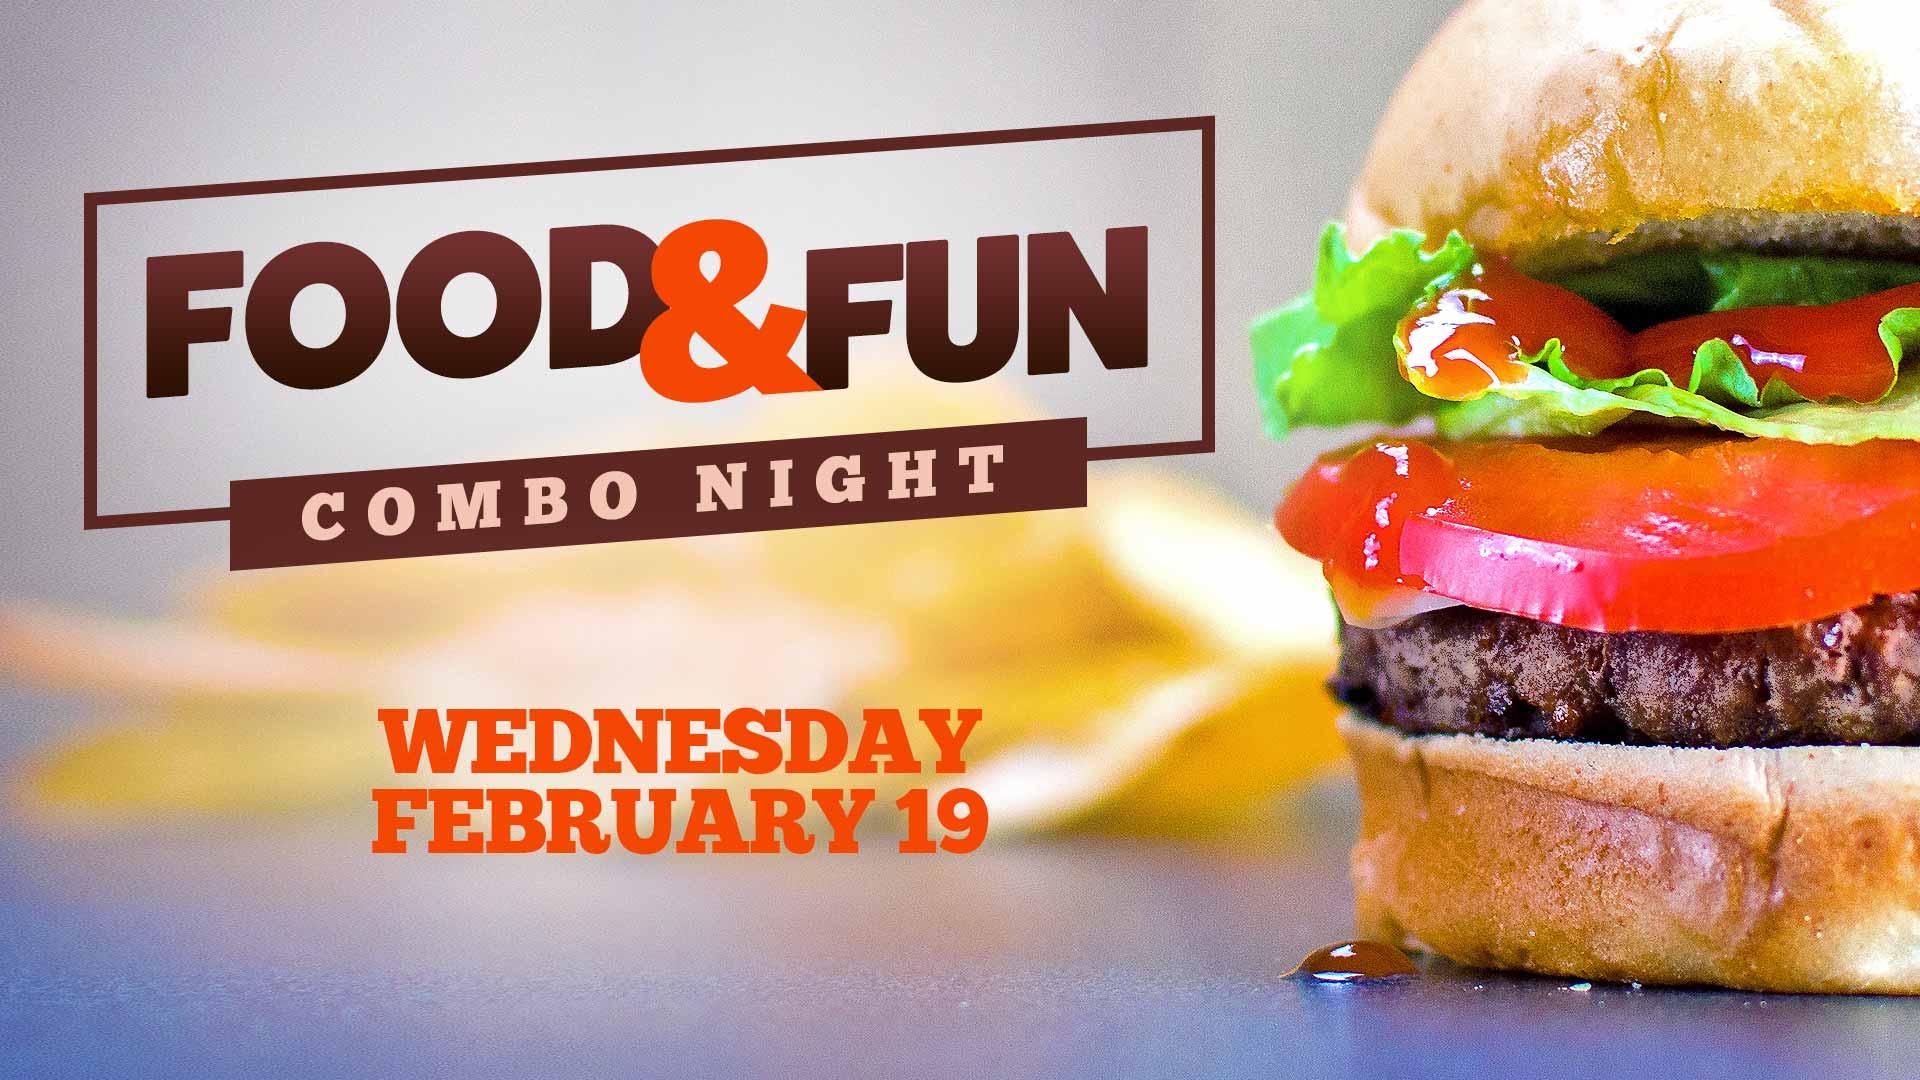 Food & Fun Combo Night at Skatetown Hysteria